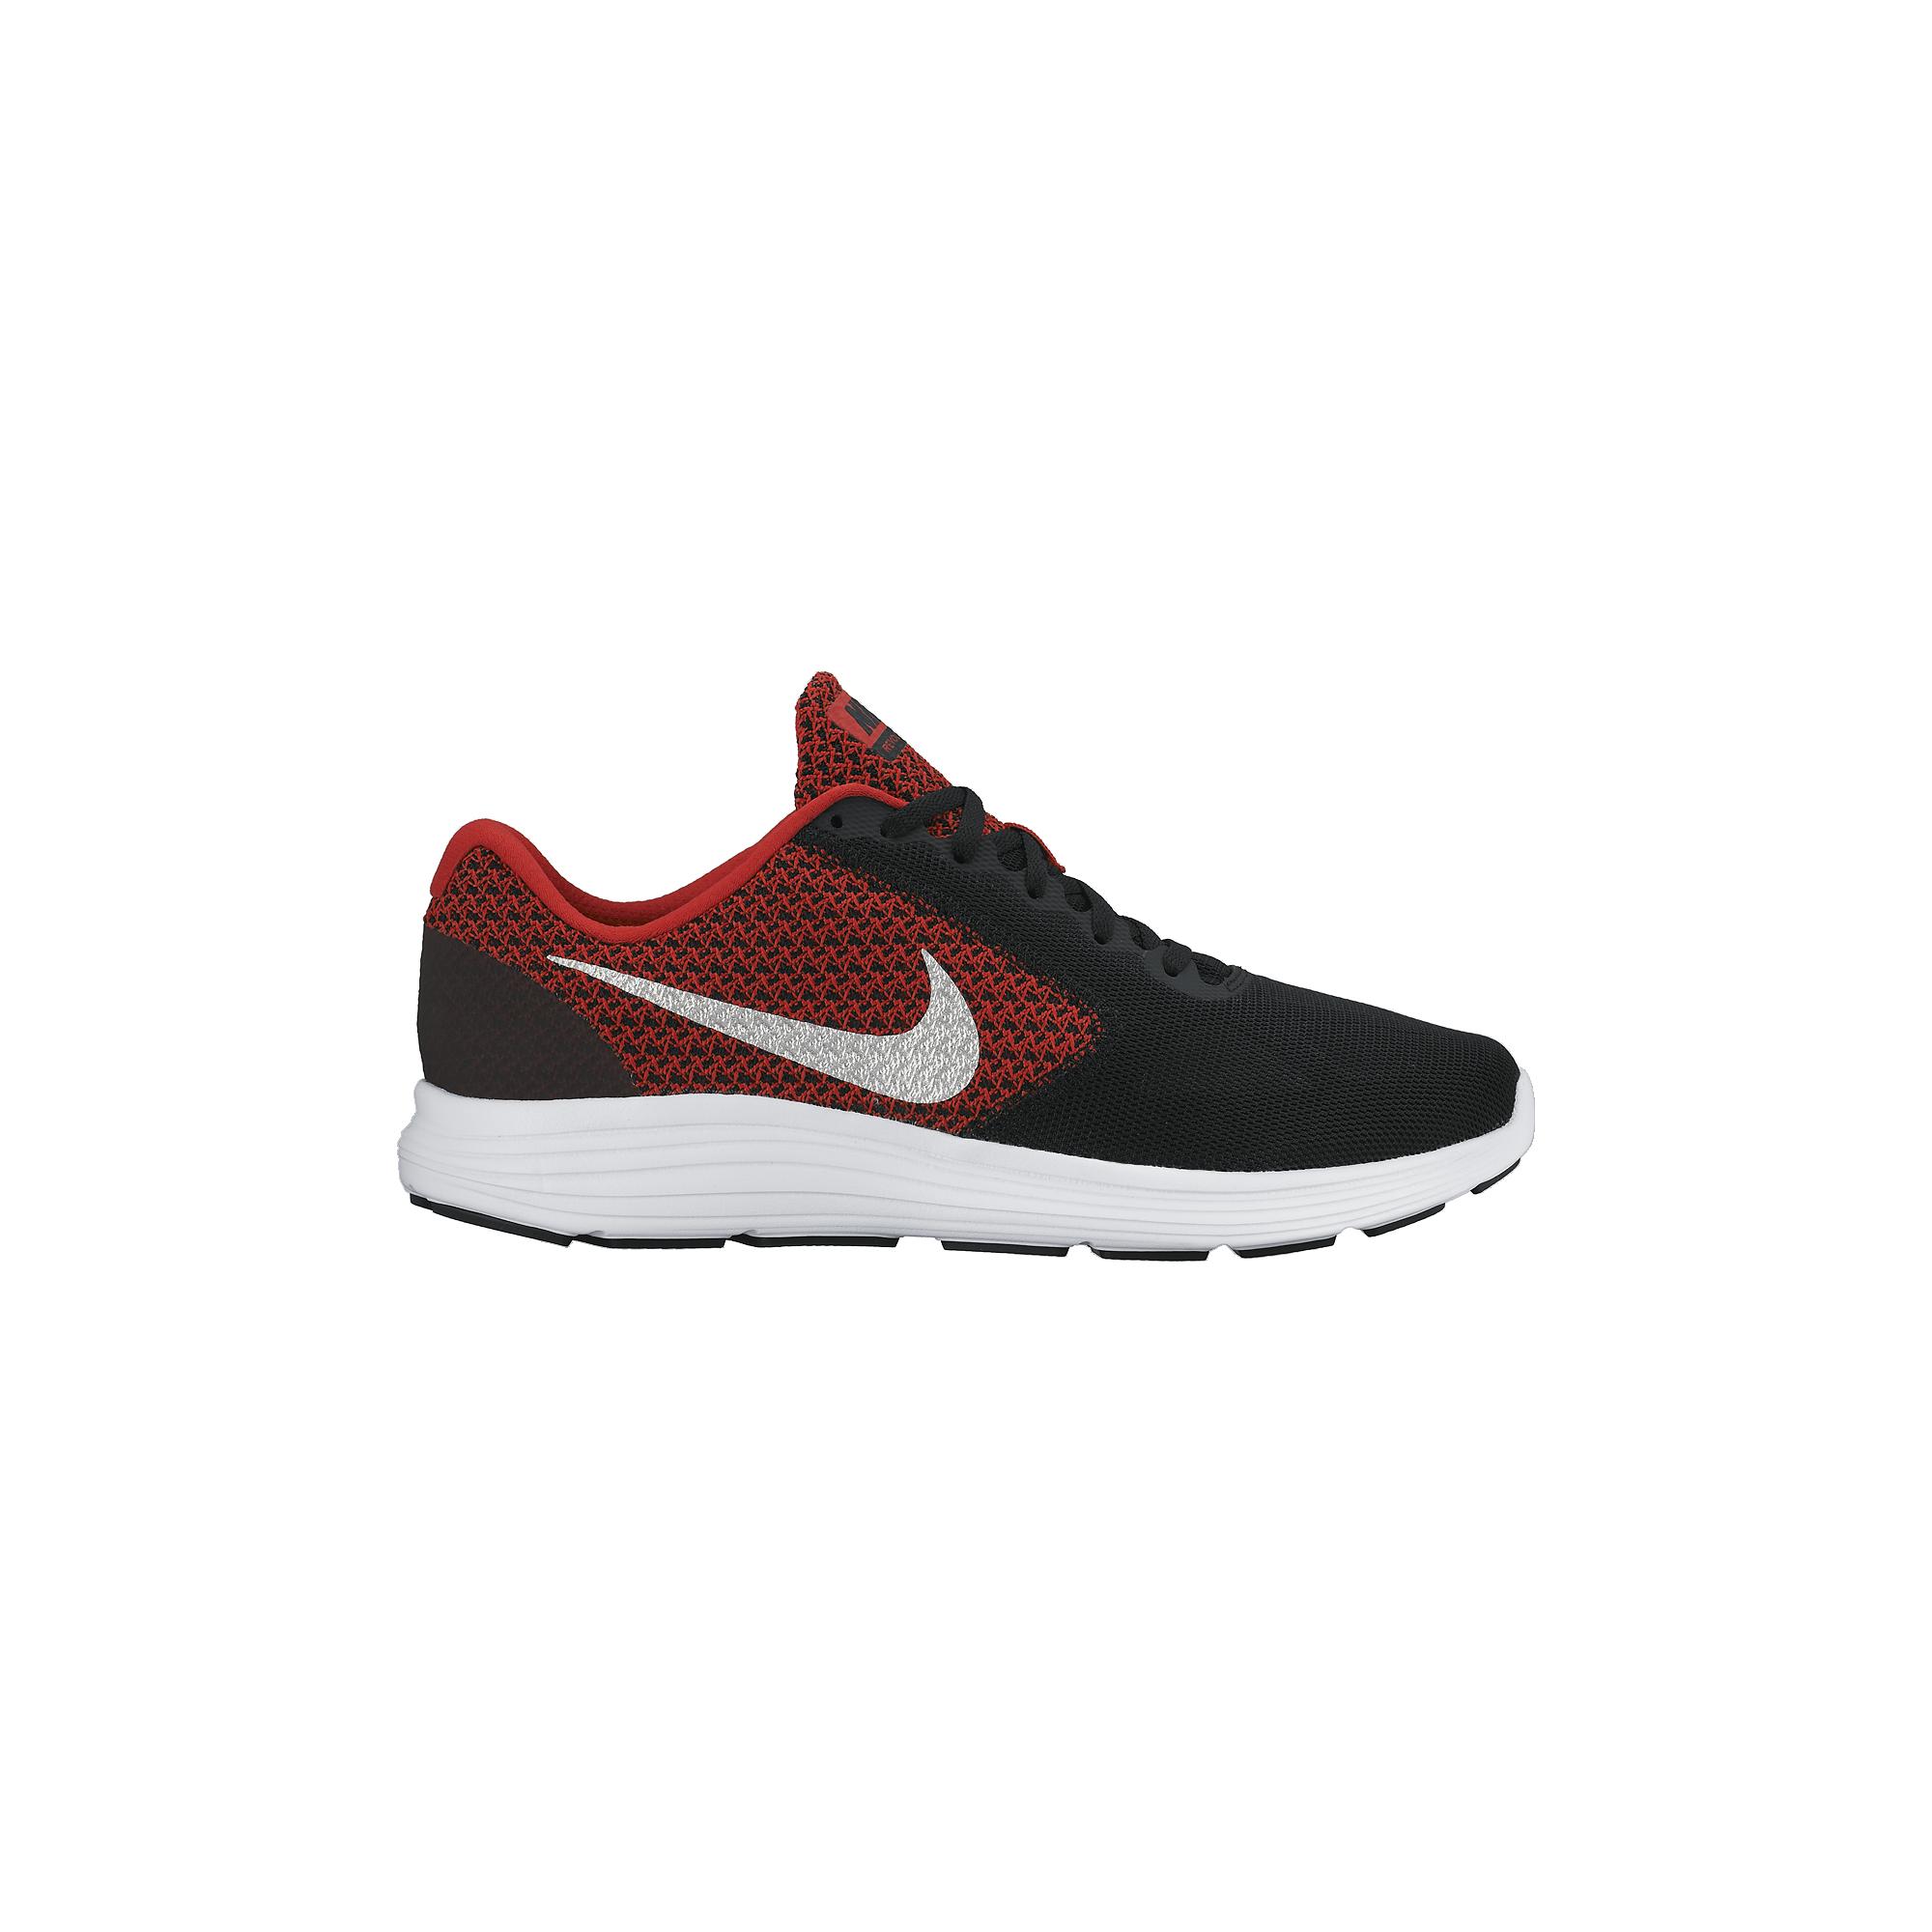 Futó Nike 819300 Cipő Férfi 600 Men 2DHIE9